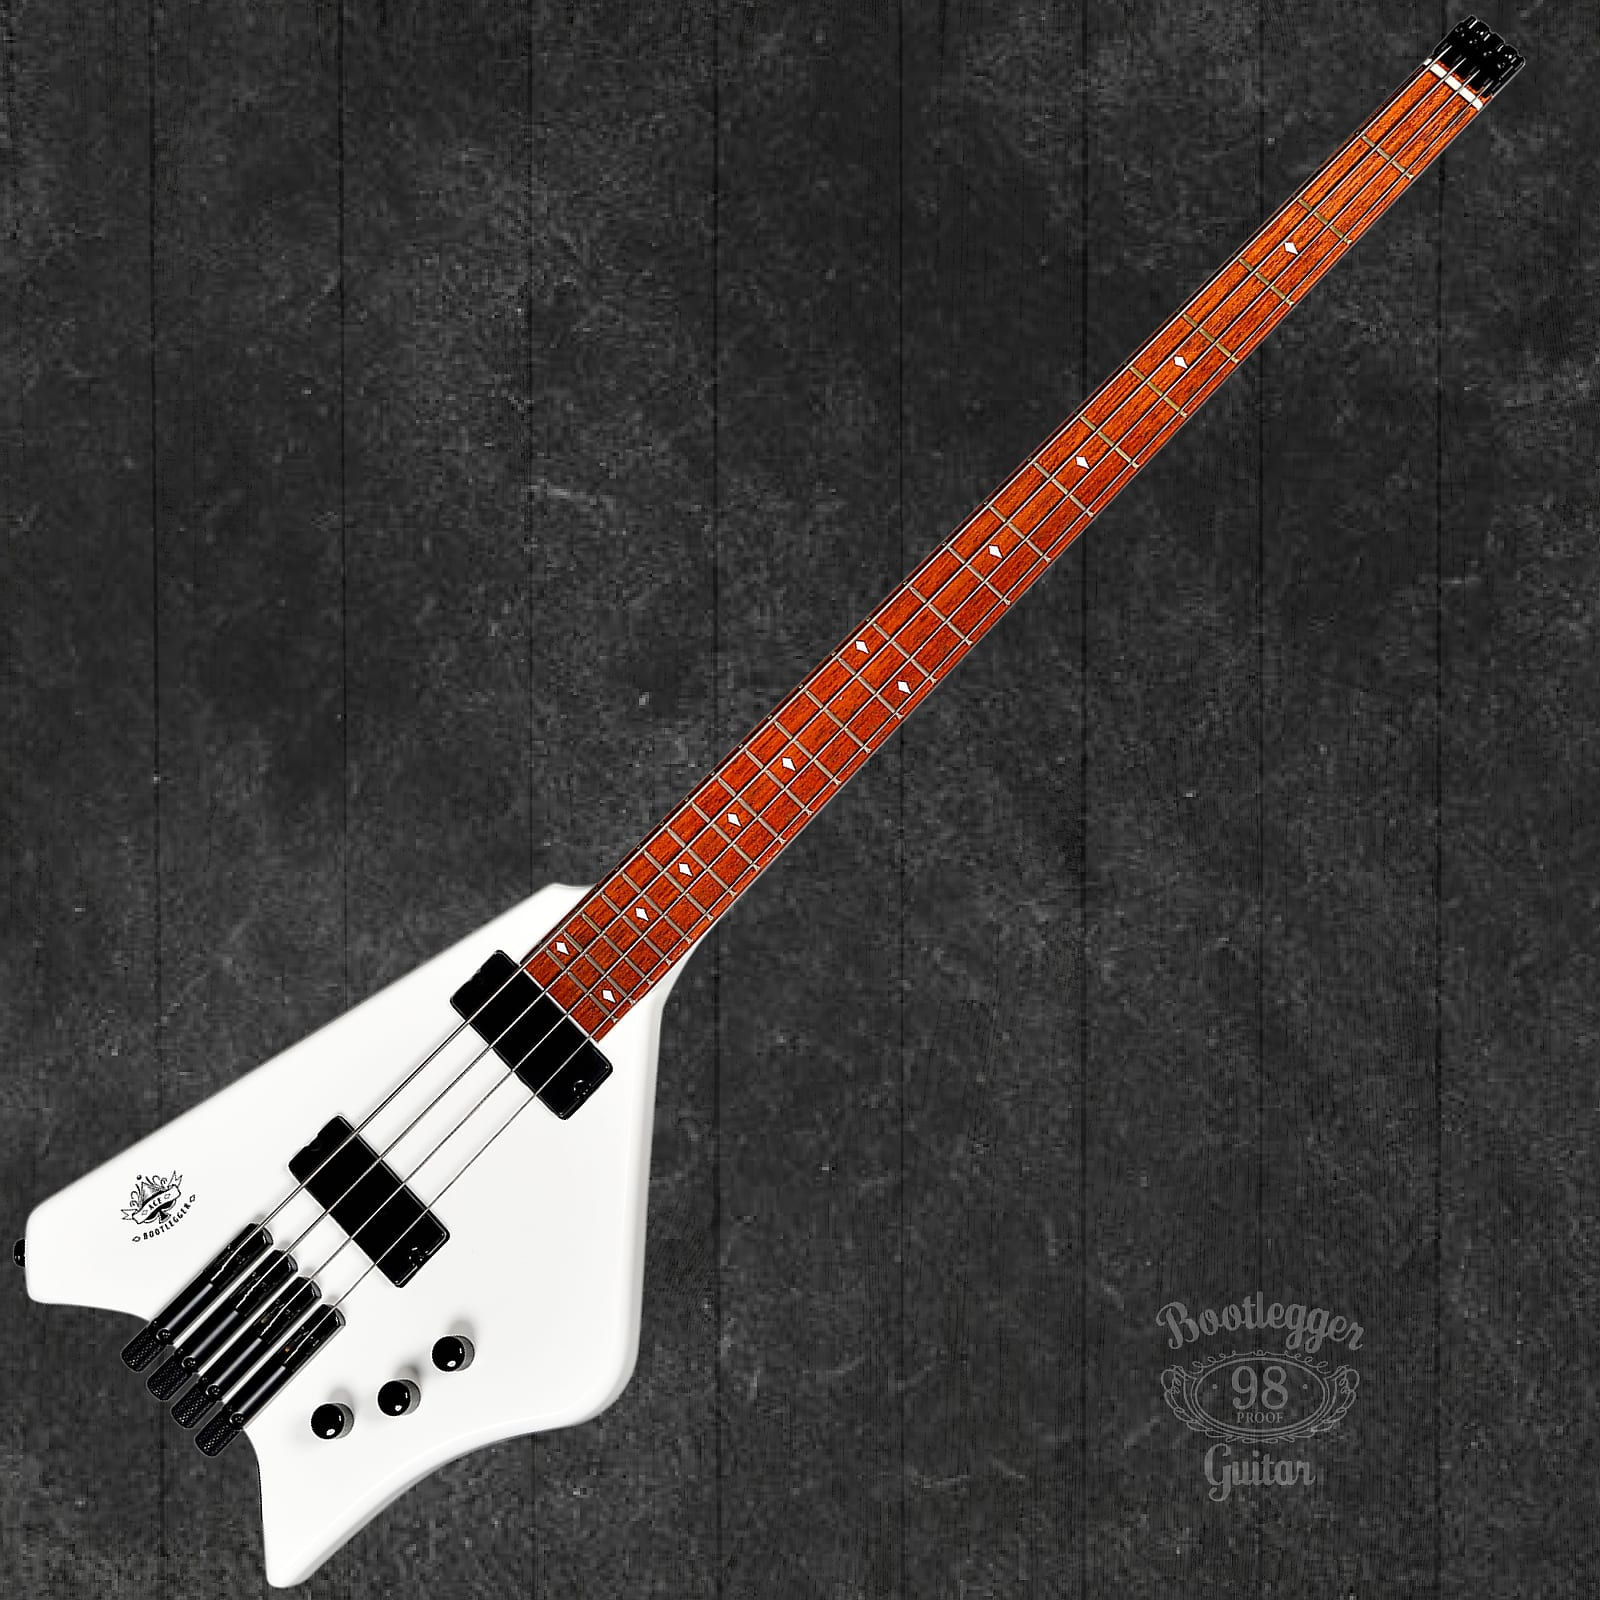 BootLegger Guitar Ace  Headless Bass White Stiletto Case &  Flask